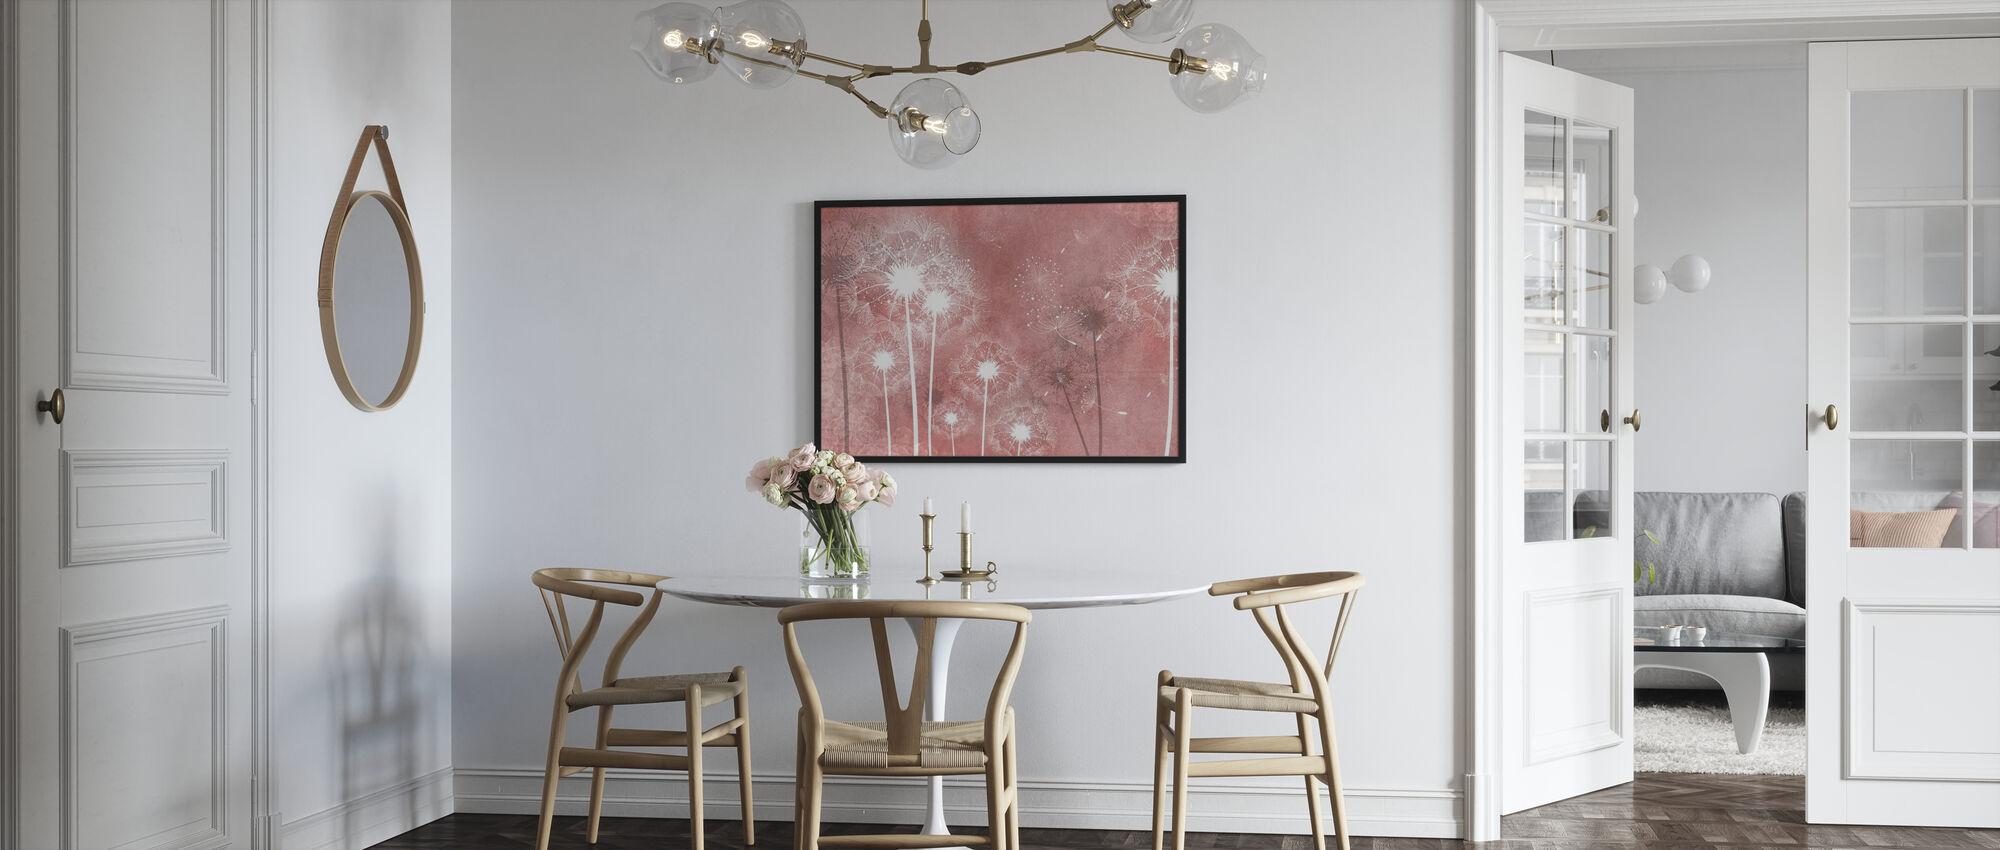 Dandelion Sky V - Poster - Kitchen